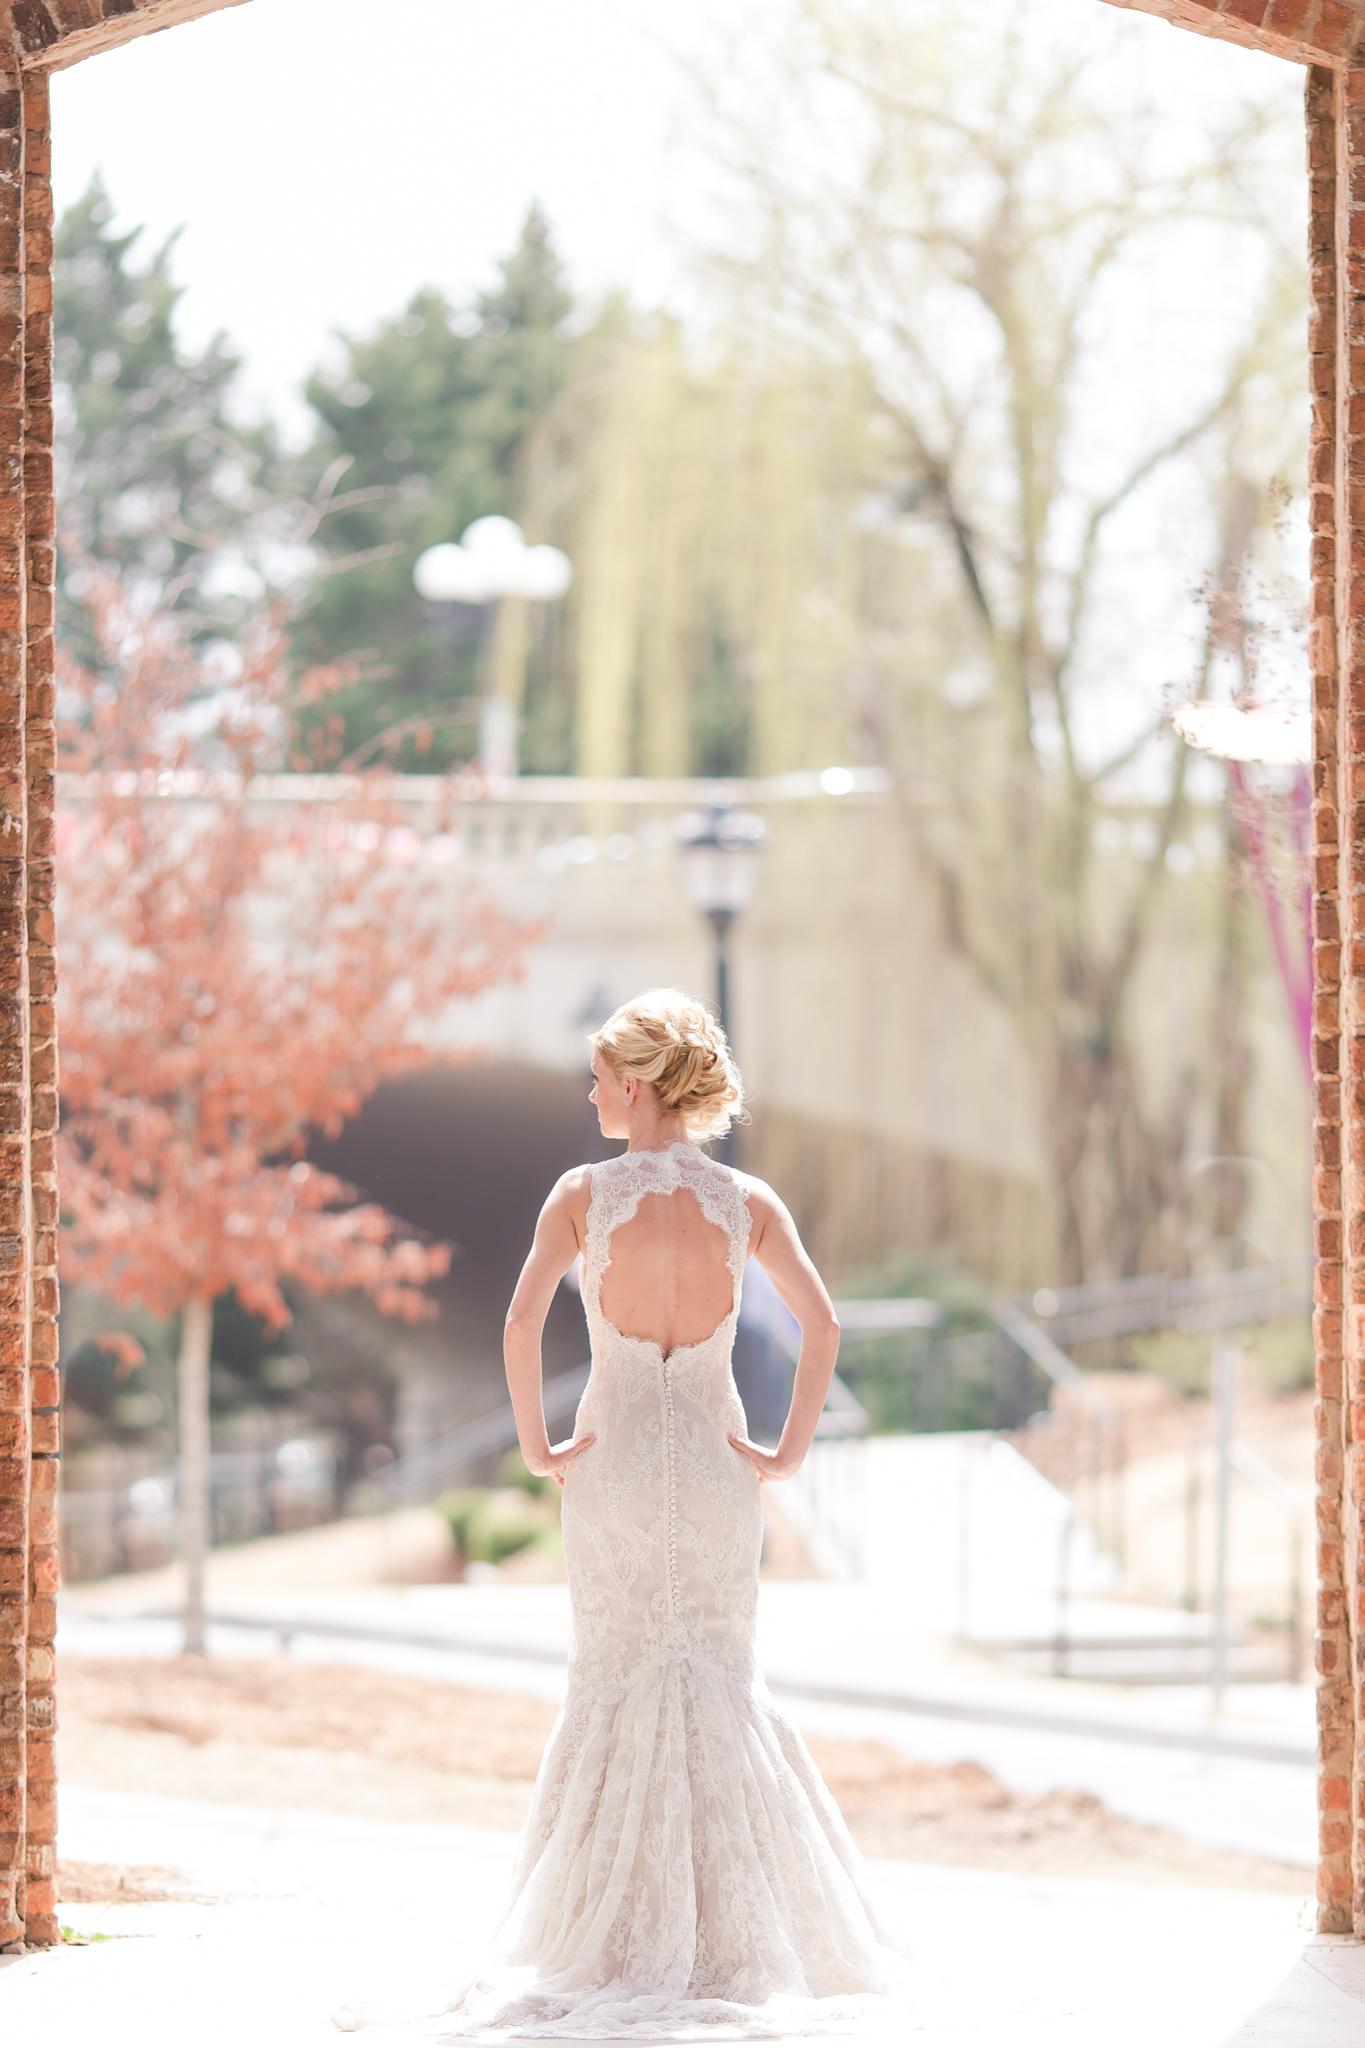 Ashley-Amber-Photo-Outdoor-Wedding-Photography-124331.jpg